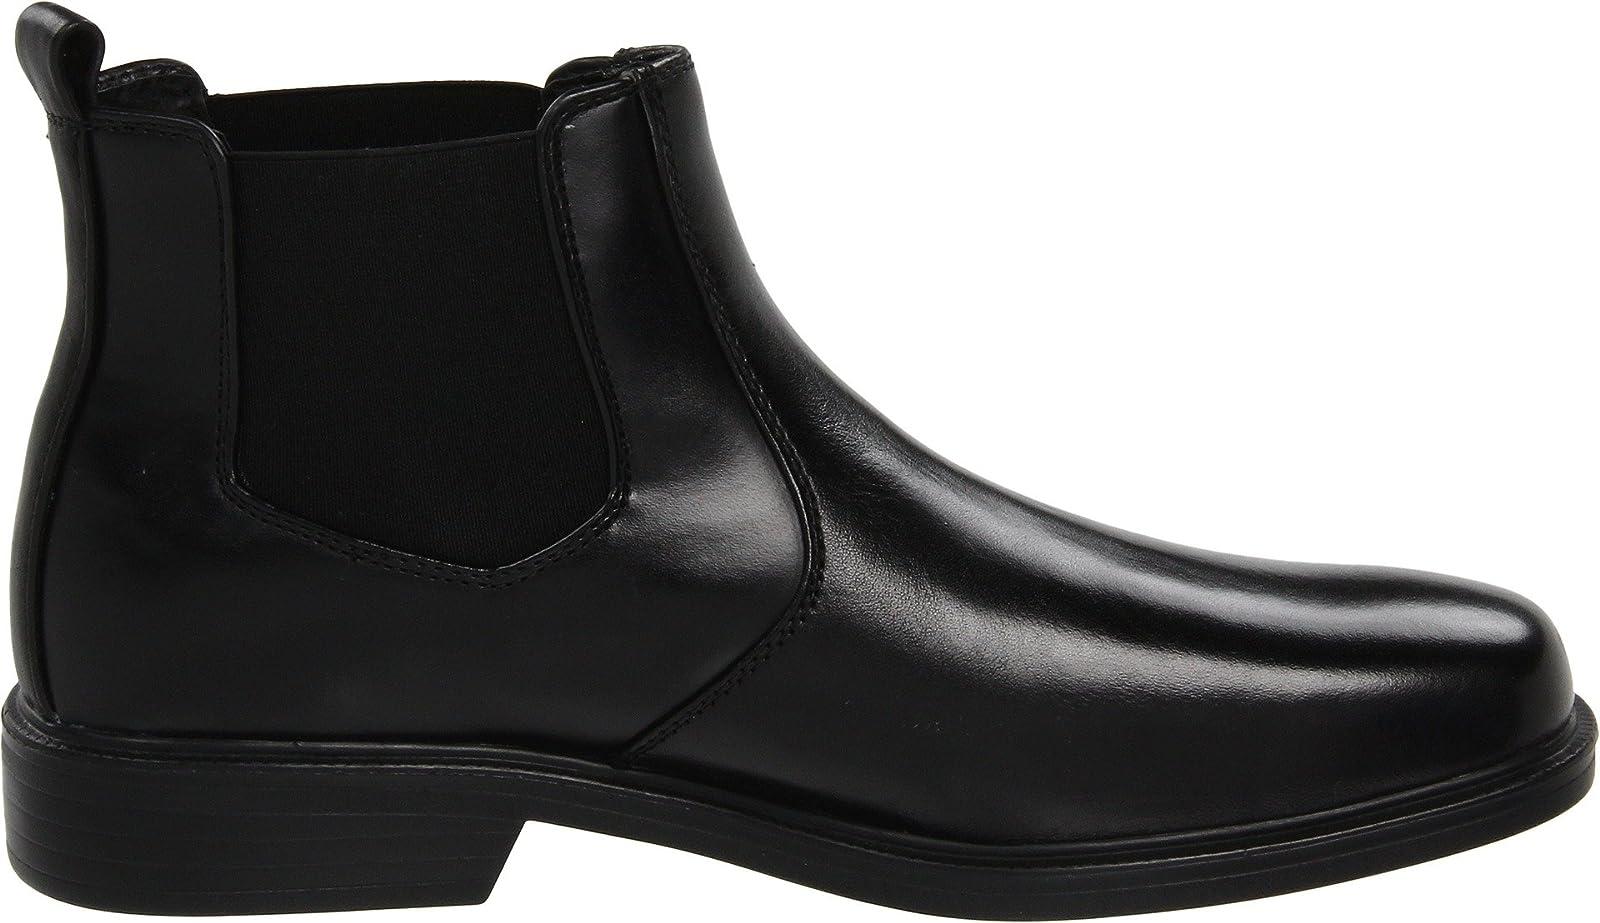 Giorgio Brutini Men's Chelsea Dress Boot Cormac Black - 6